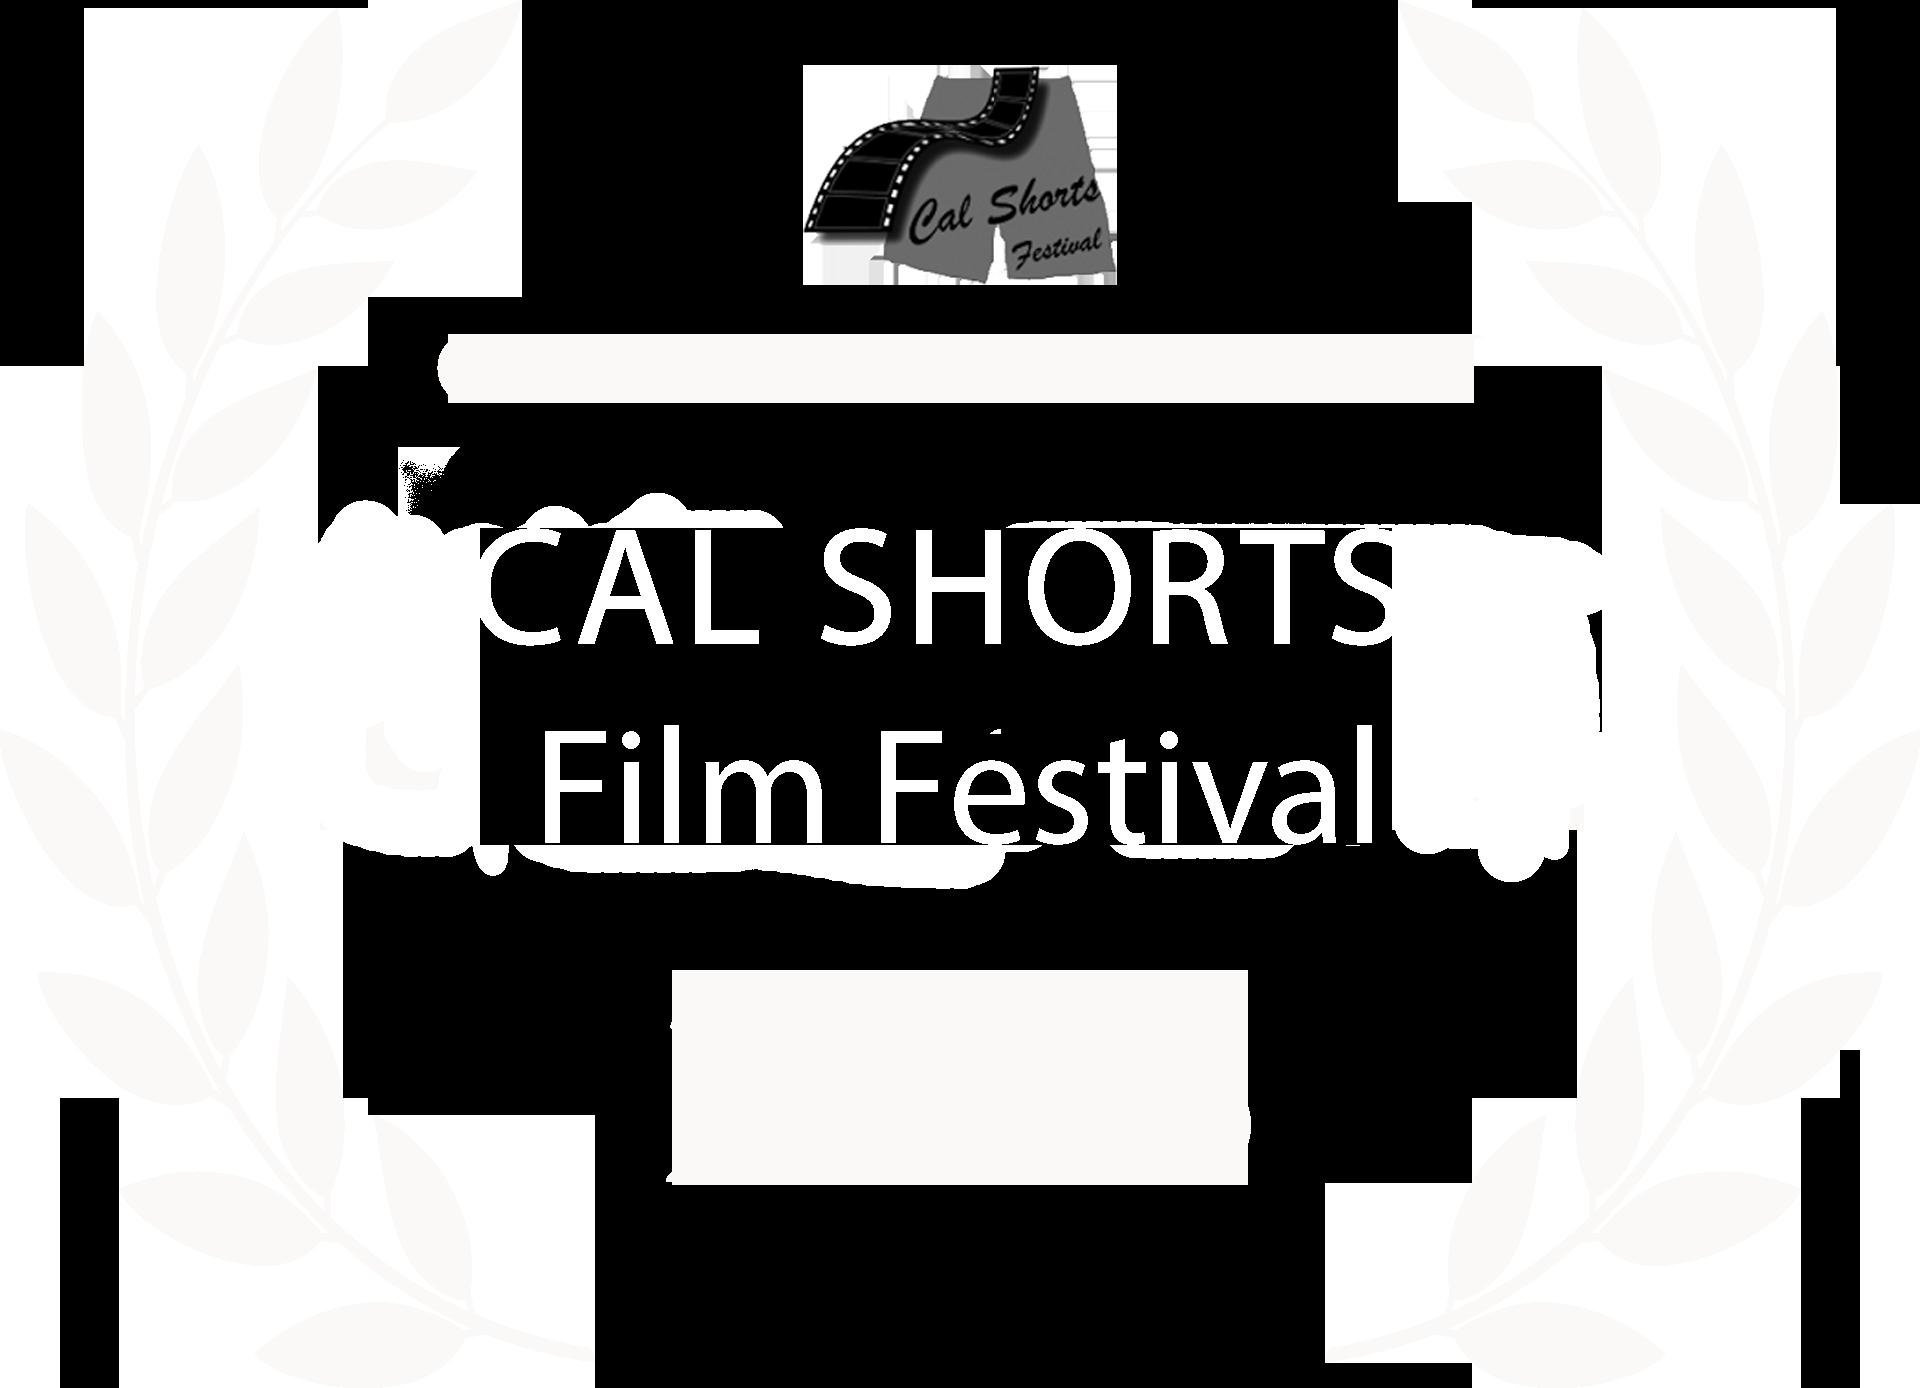 cal shorts FF transparent background.png